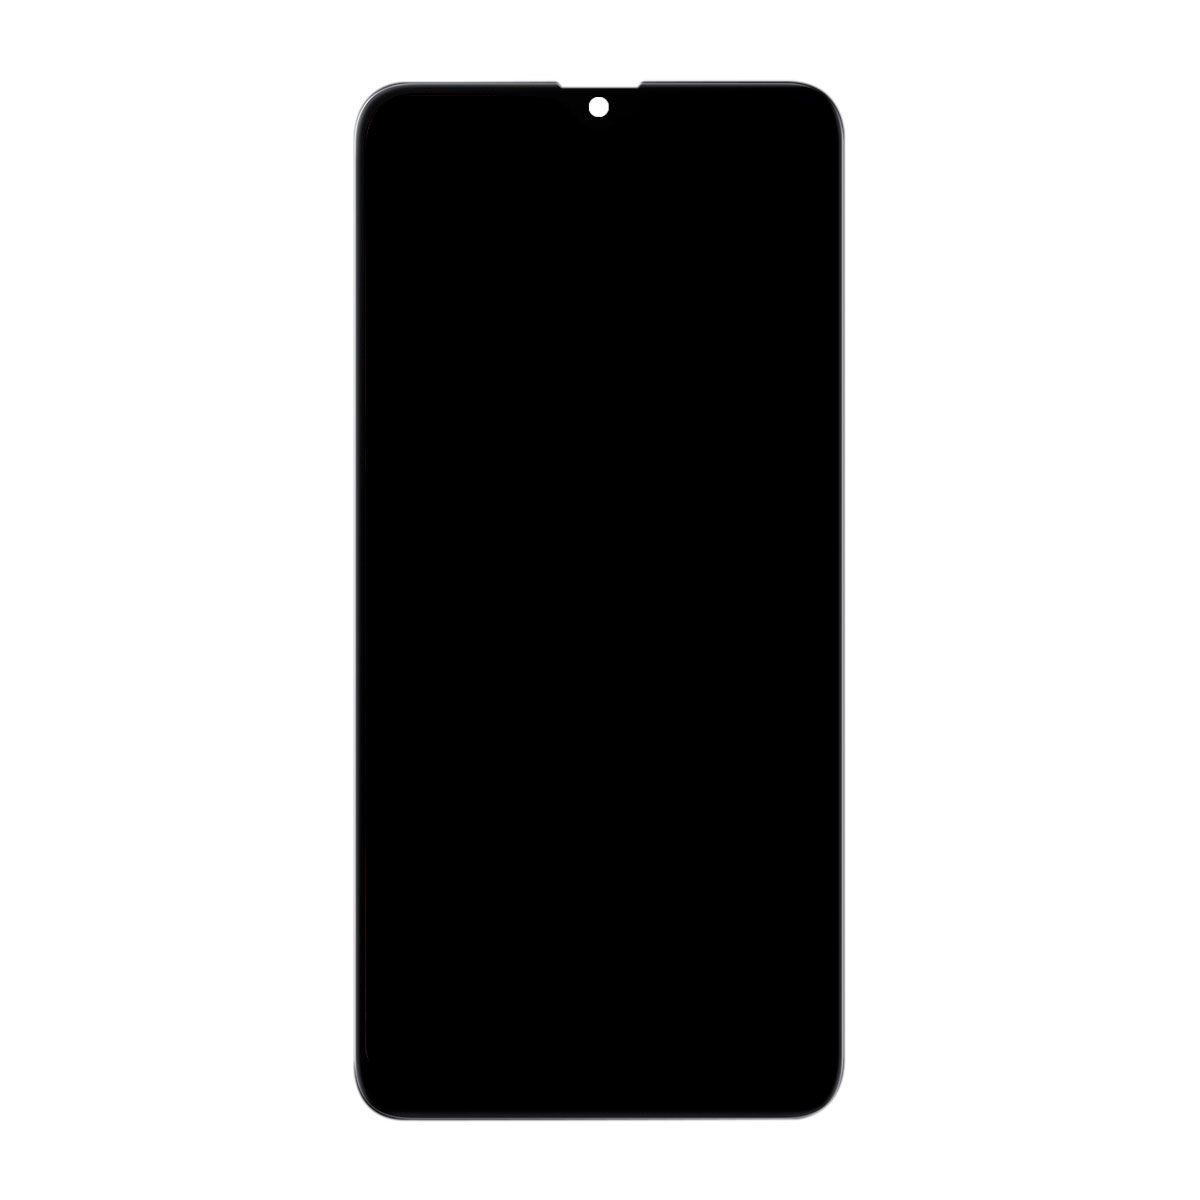 Tela Touch Screen Display Lcd Galaxy A10 2019